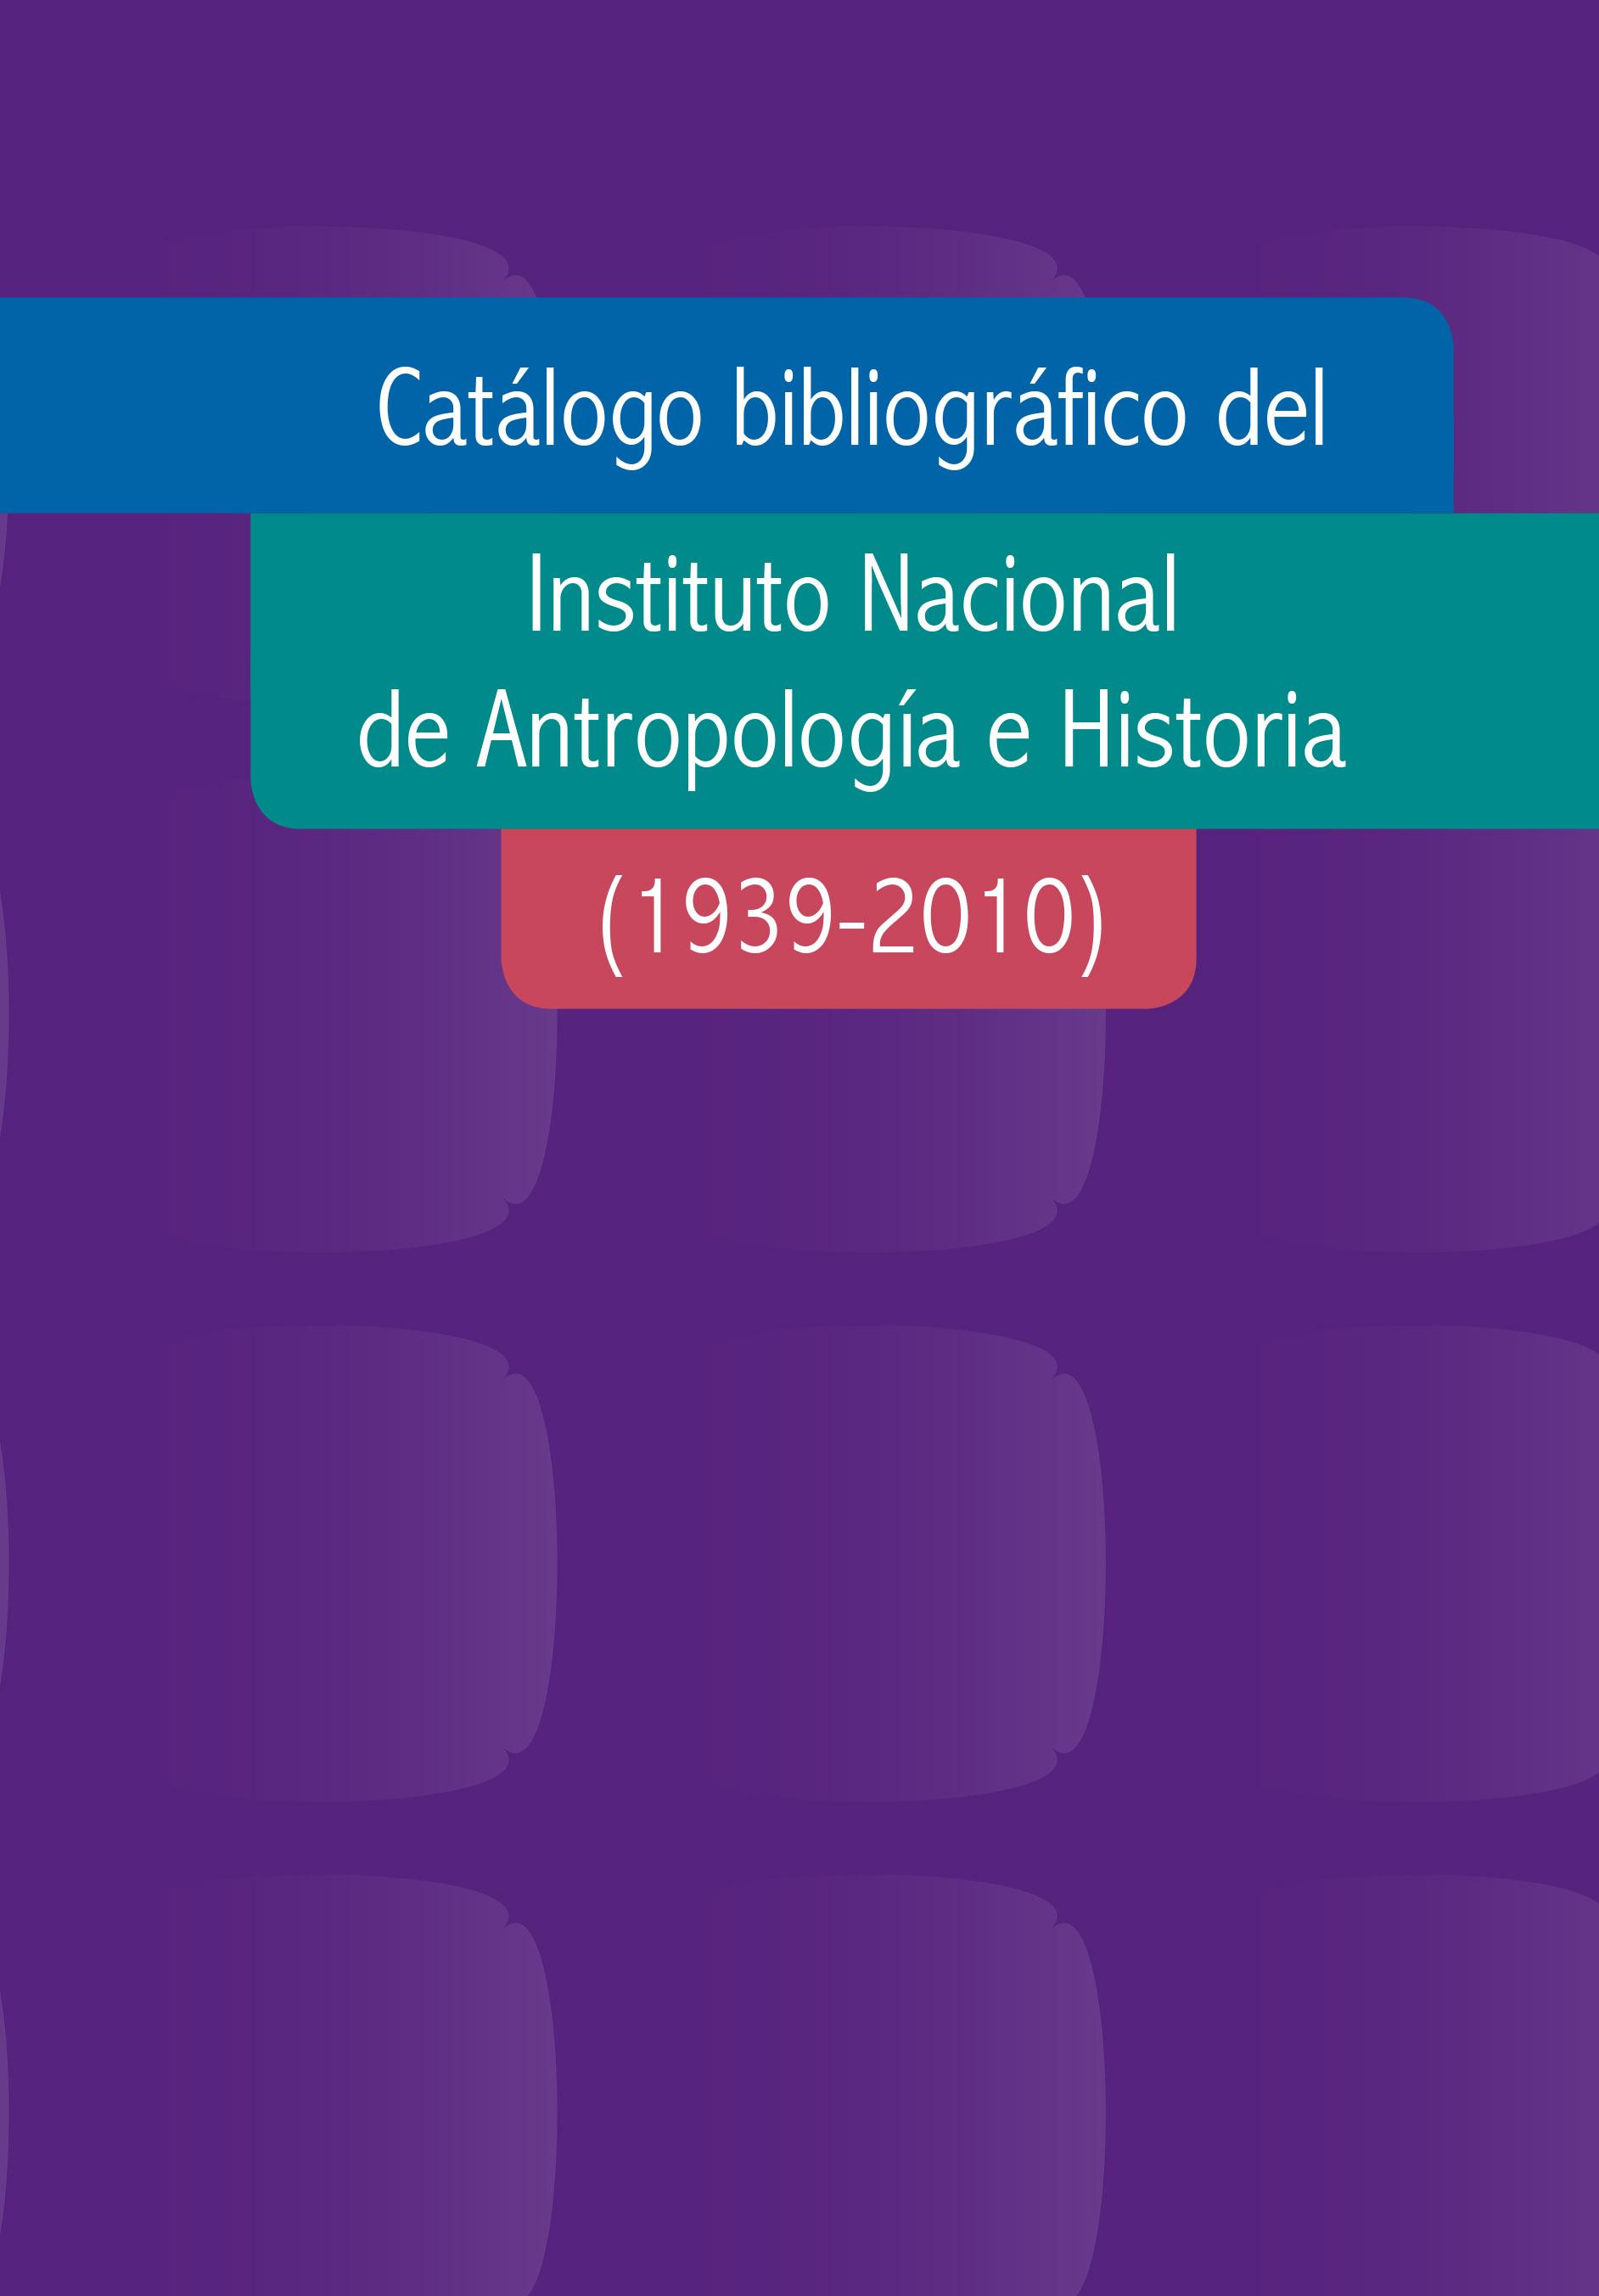 Catálogo bibliográfico del Instituto Nacional de Antropología e Historia (1939-2010)